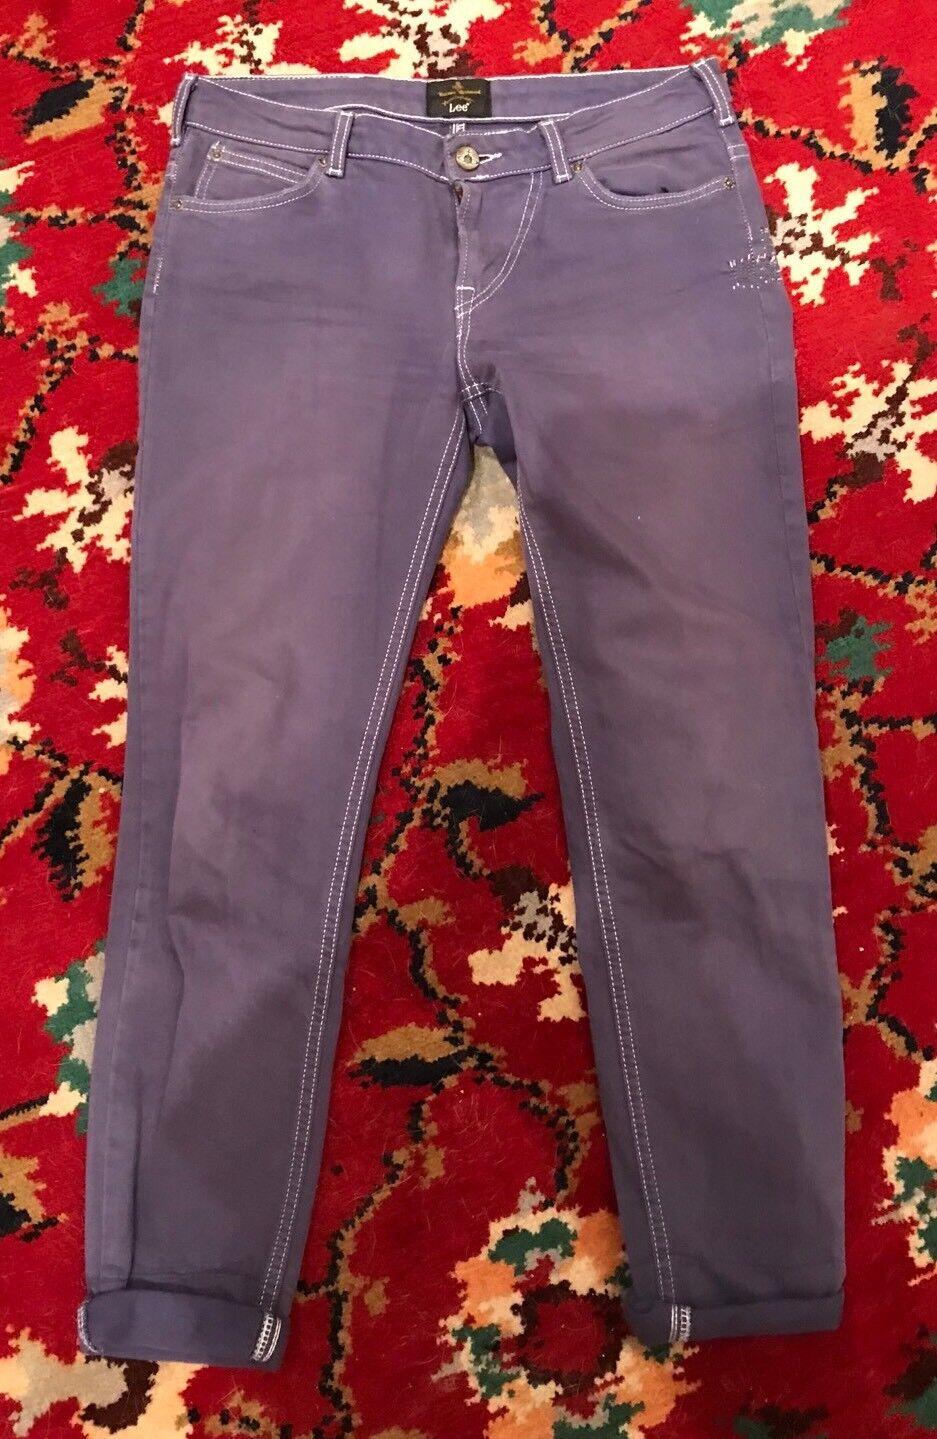 Vivienne Westwood Purple Skinny Jeans Size 28